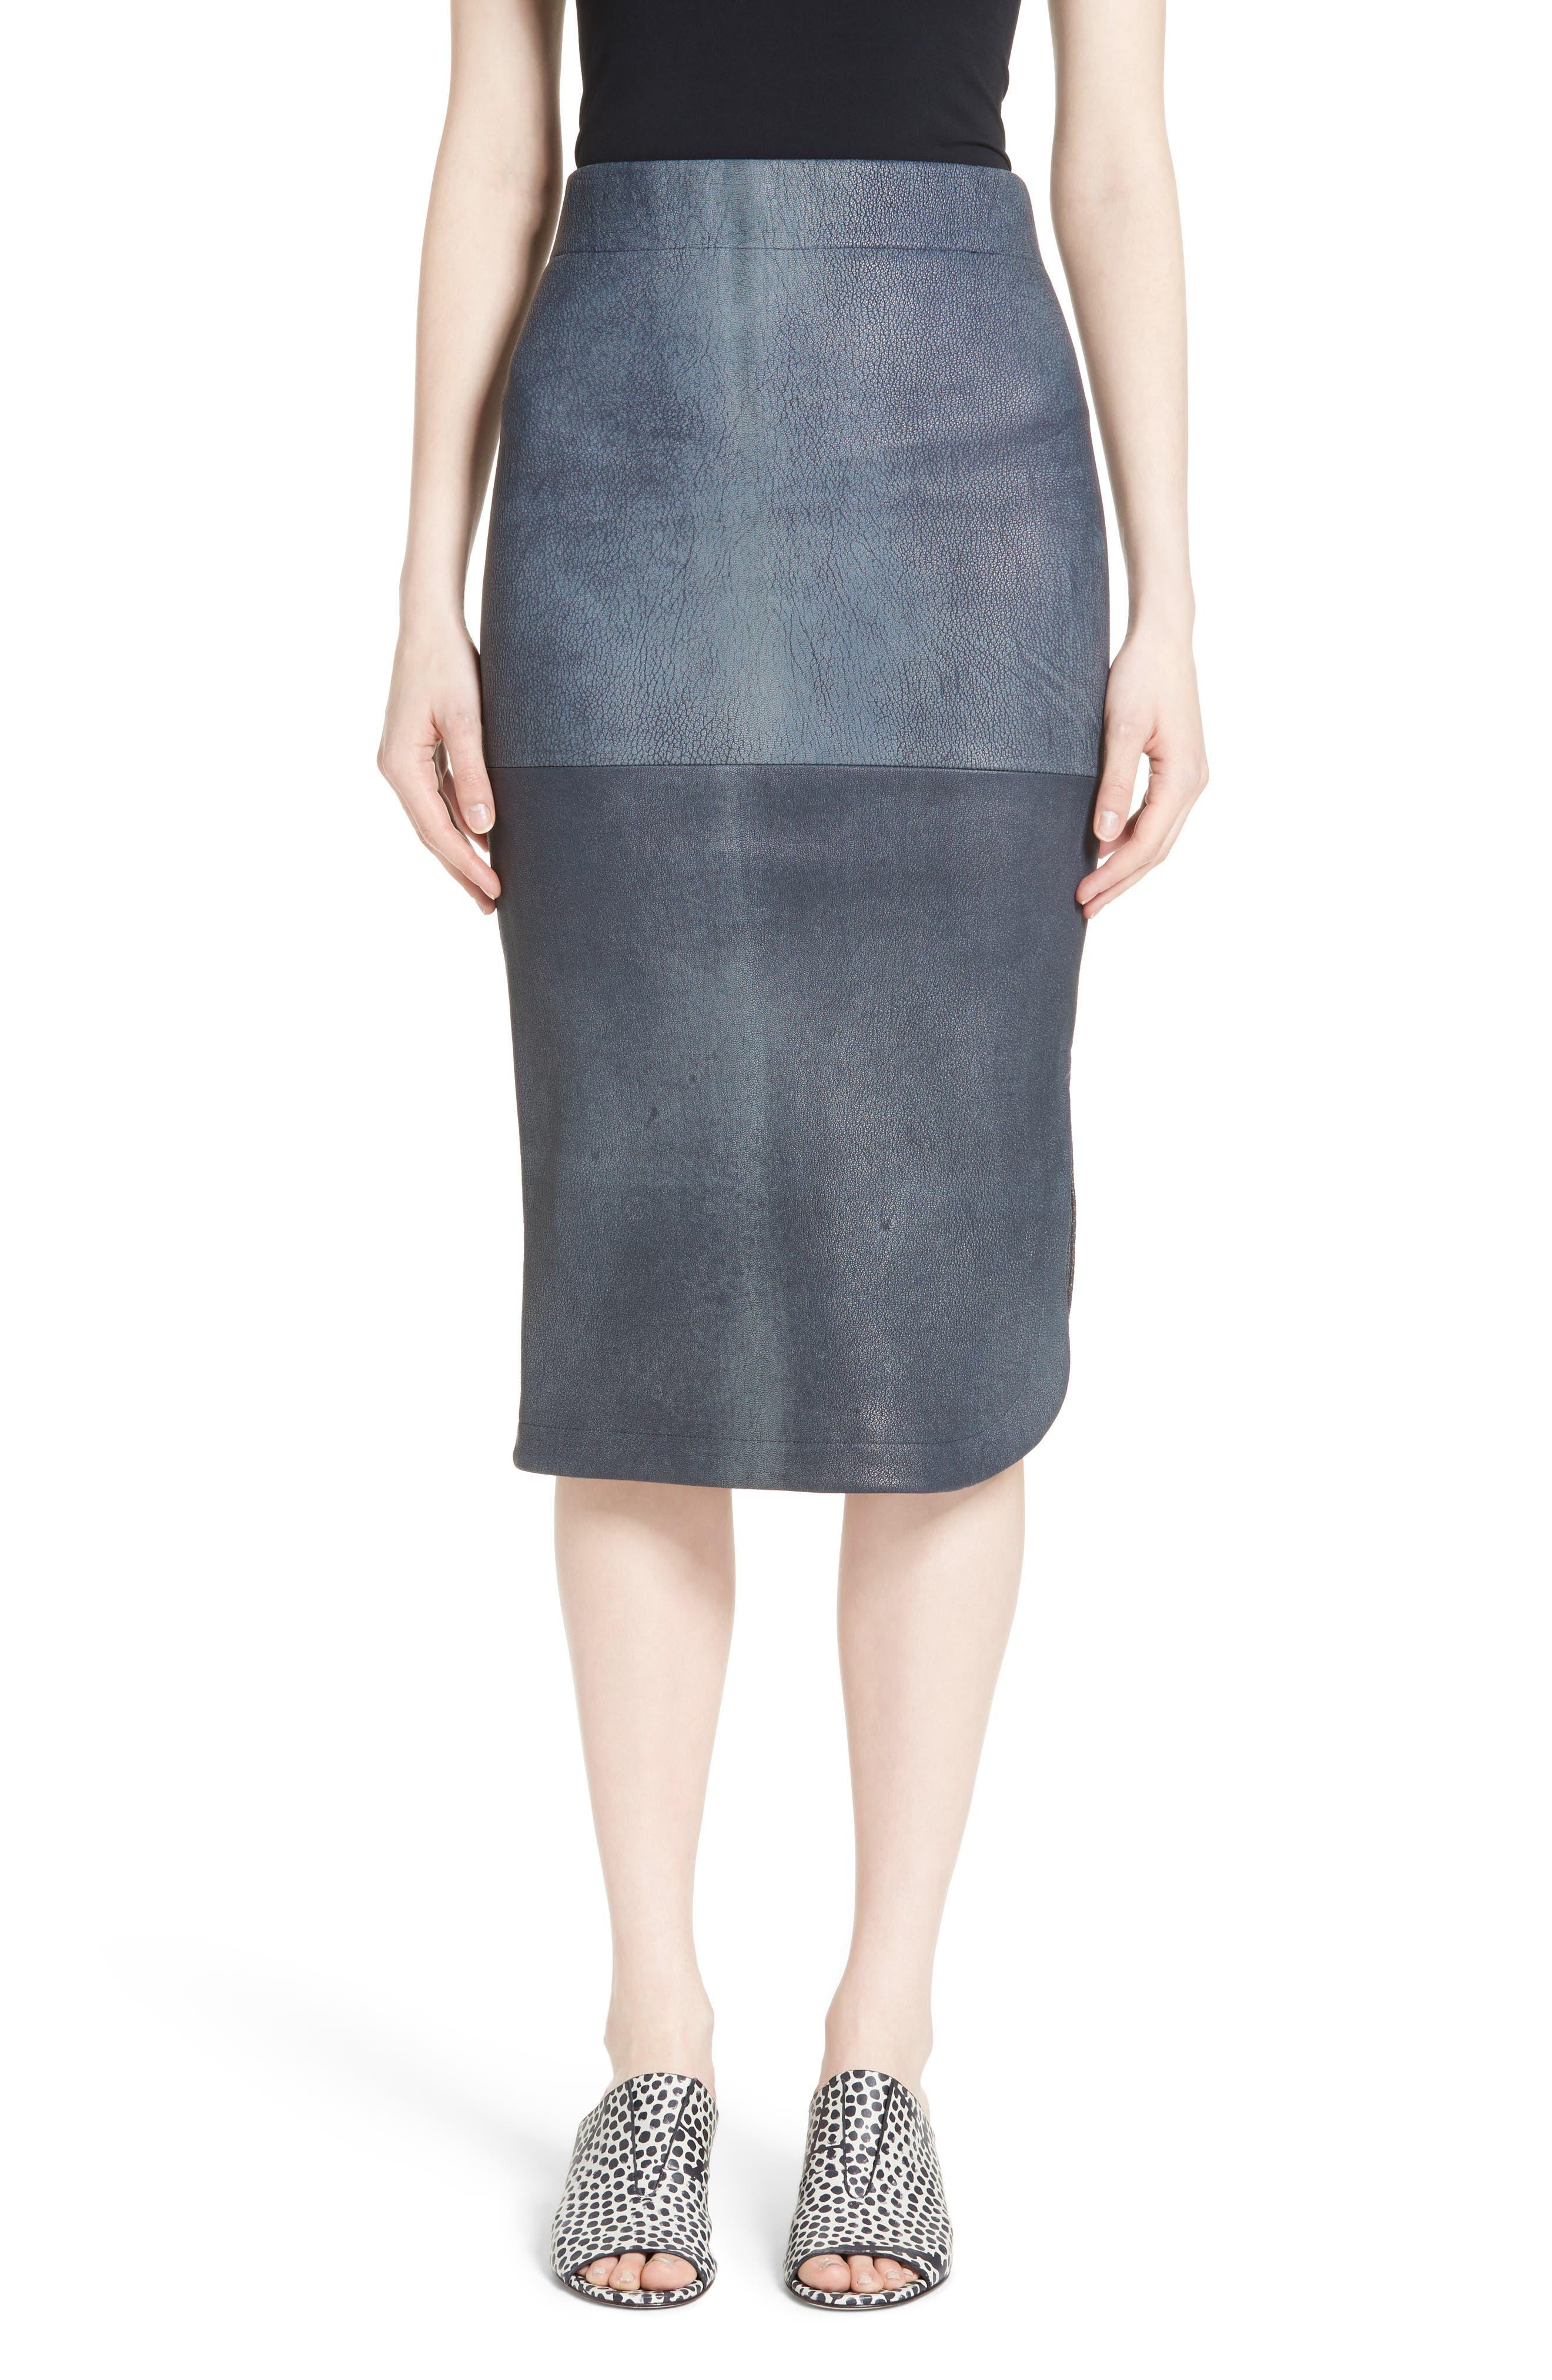 Main Image - Zero + Maria Cornejo Rai Leather Curved Skirt